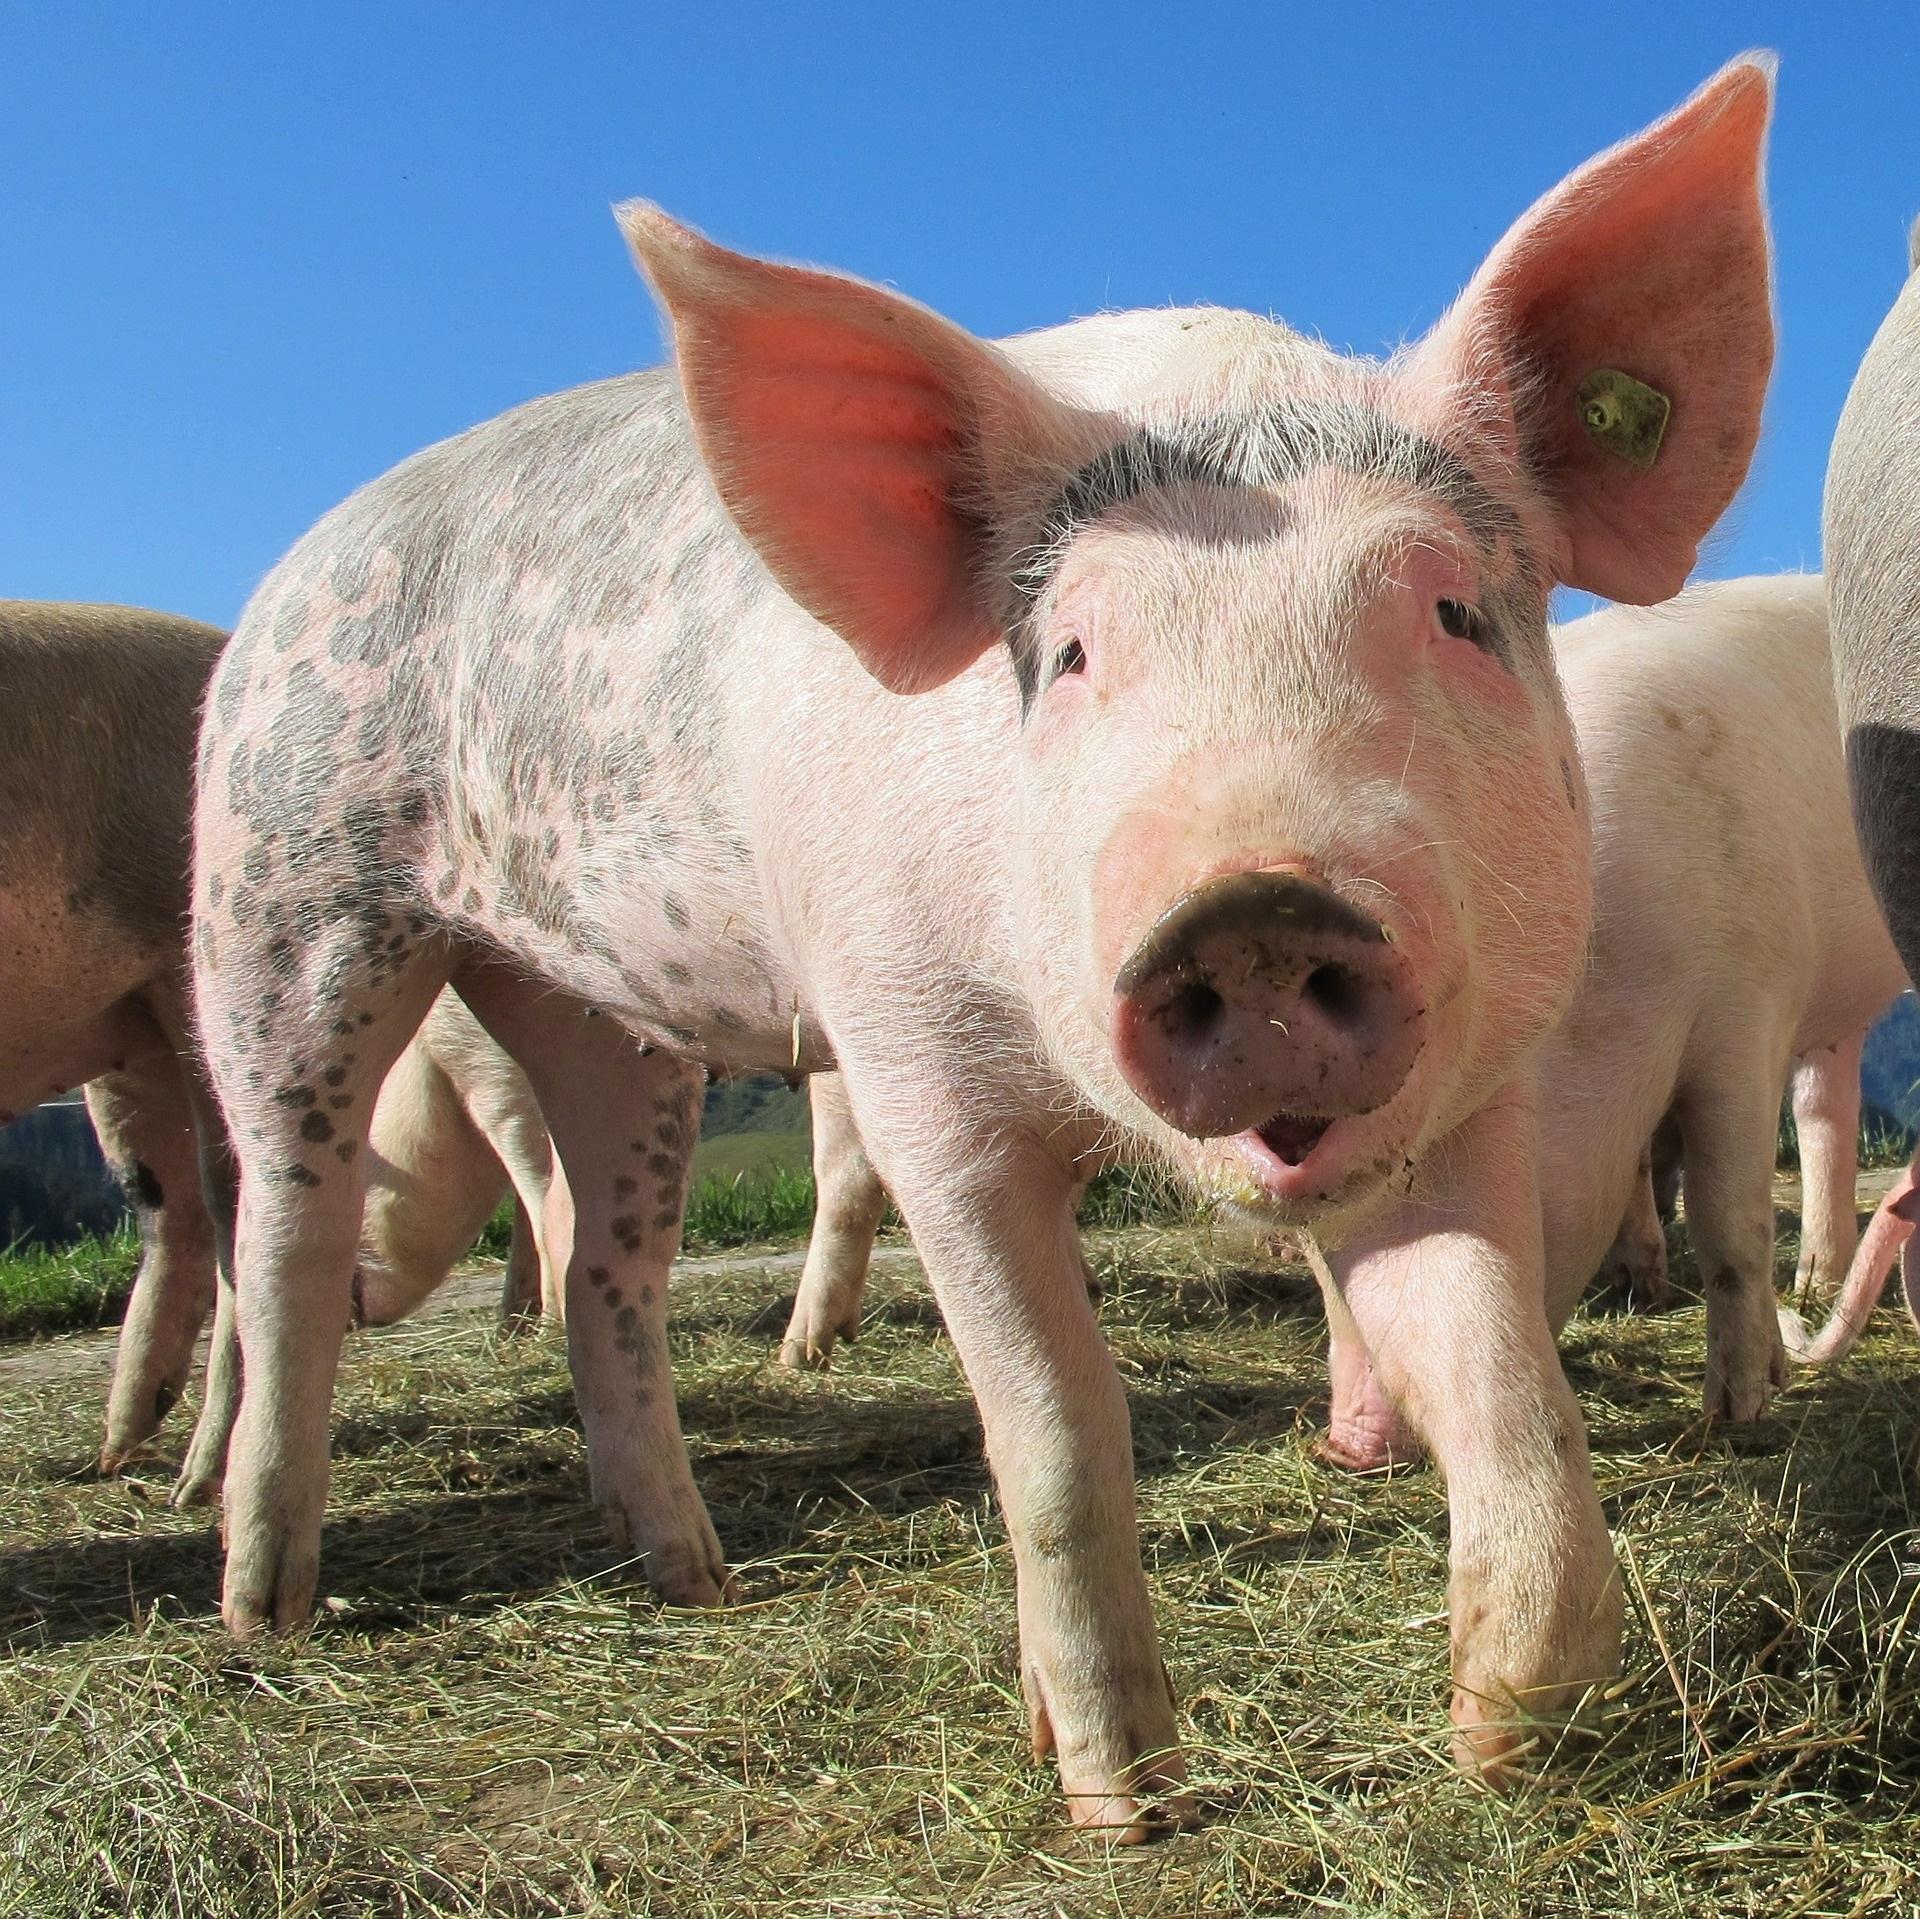 Avoid the PIG of instant gratification